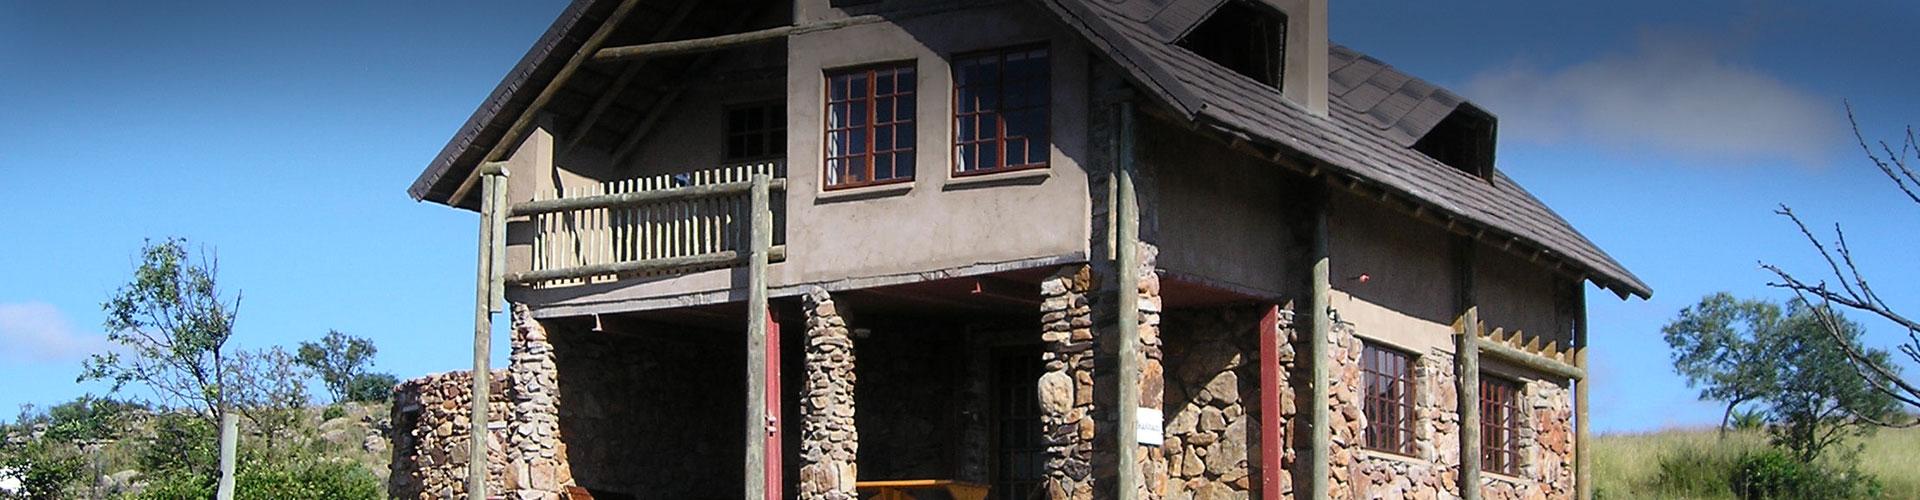 Bermanzi Hiking and Guest House